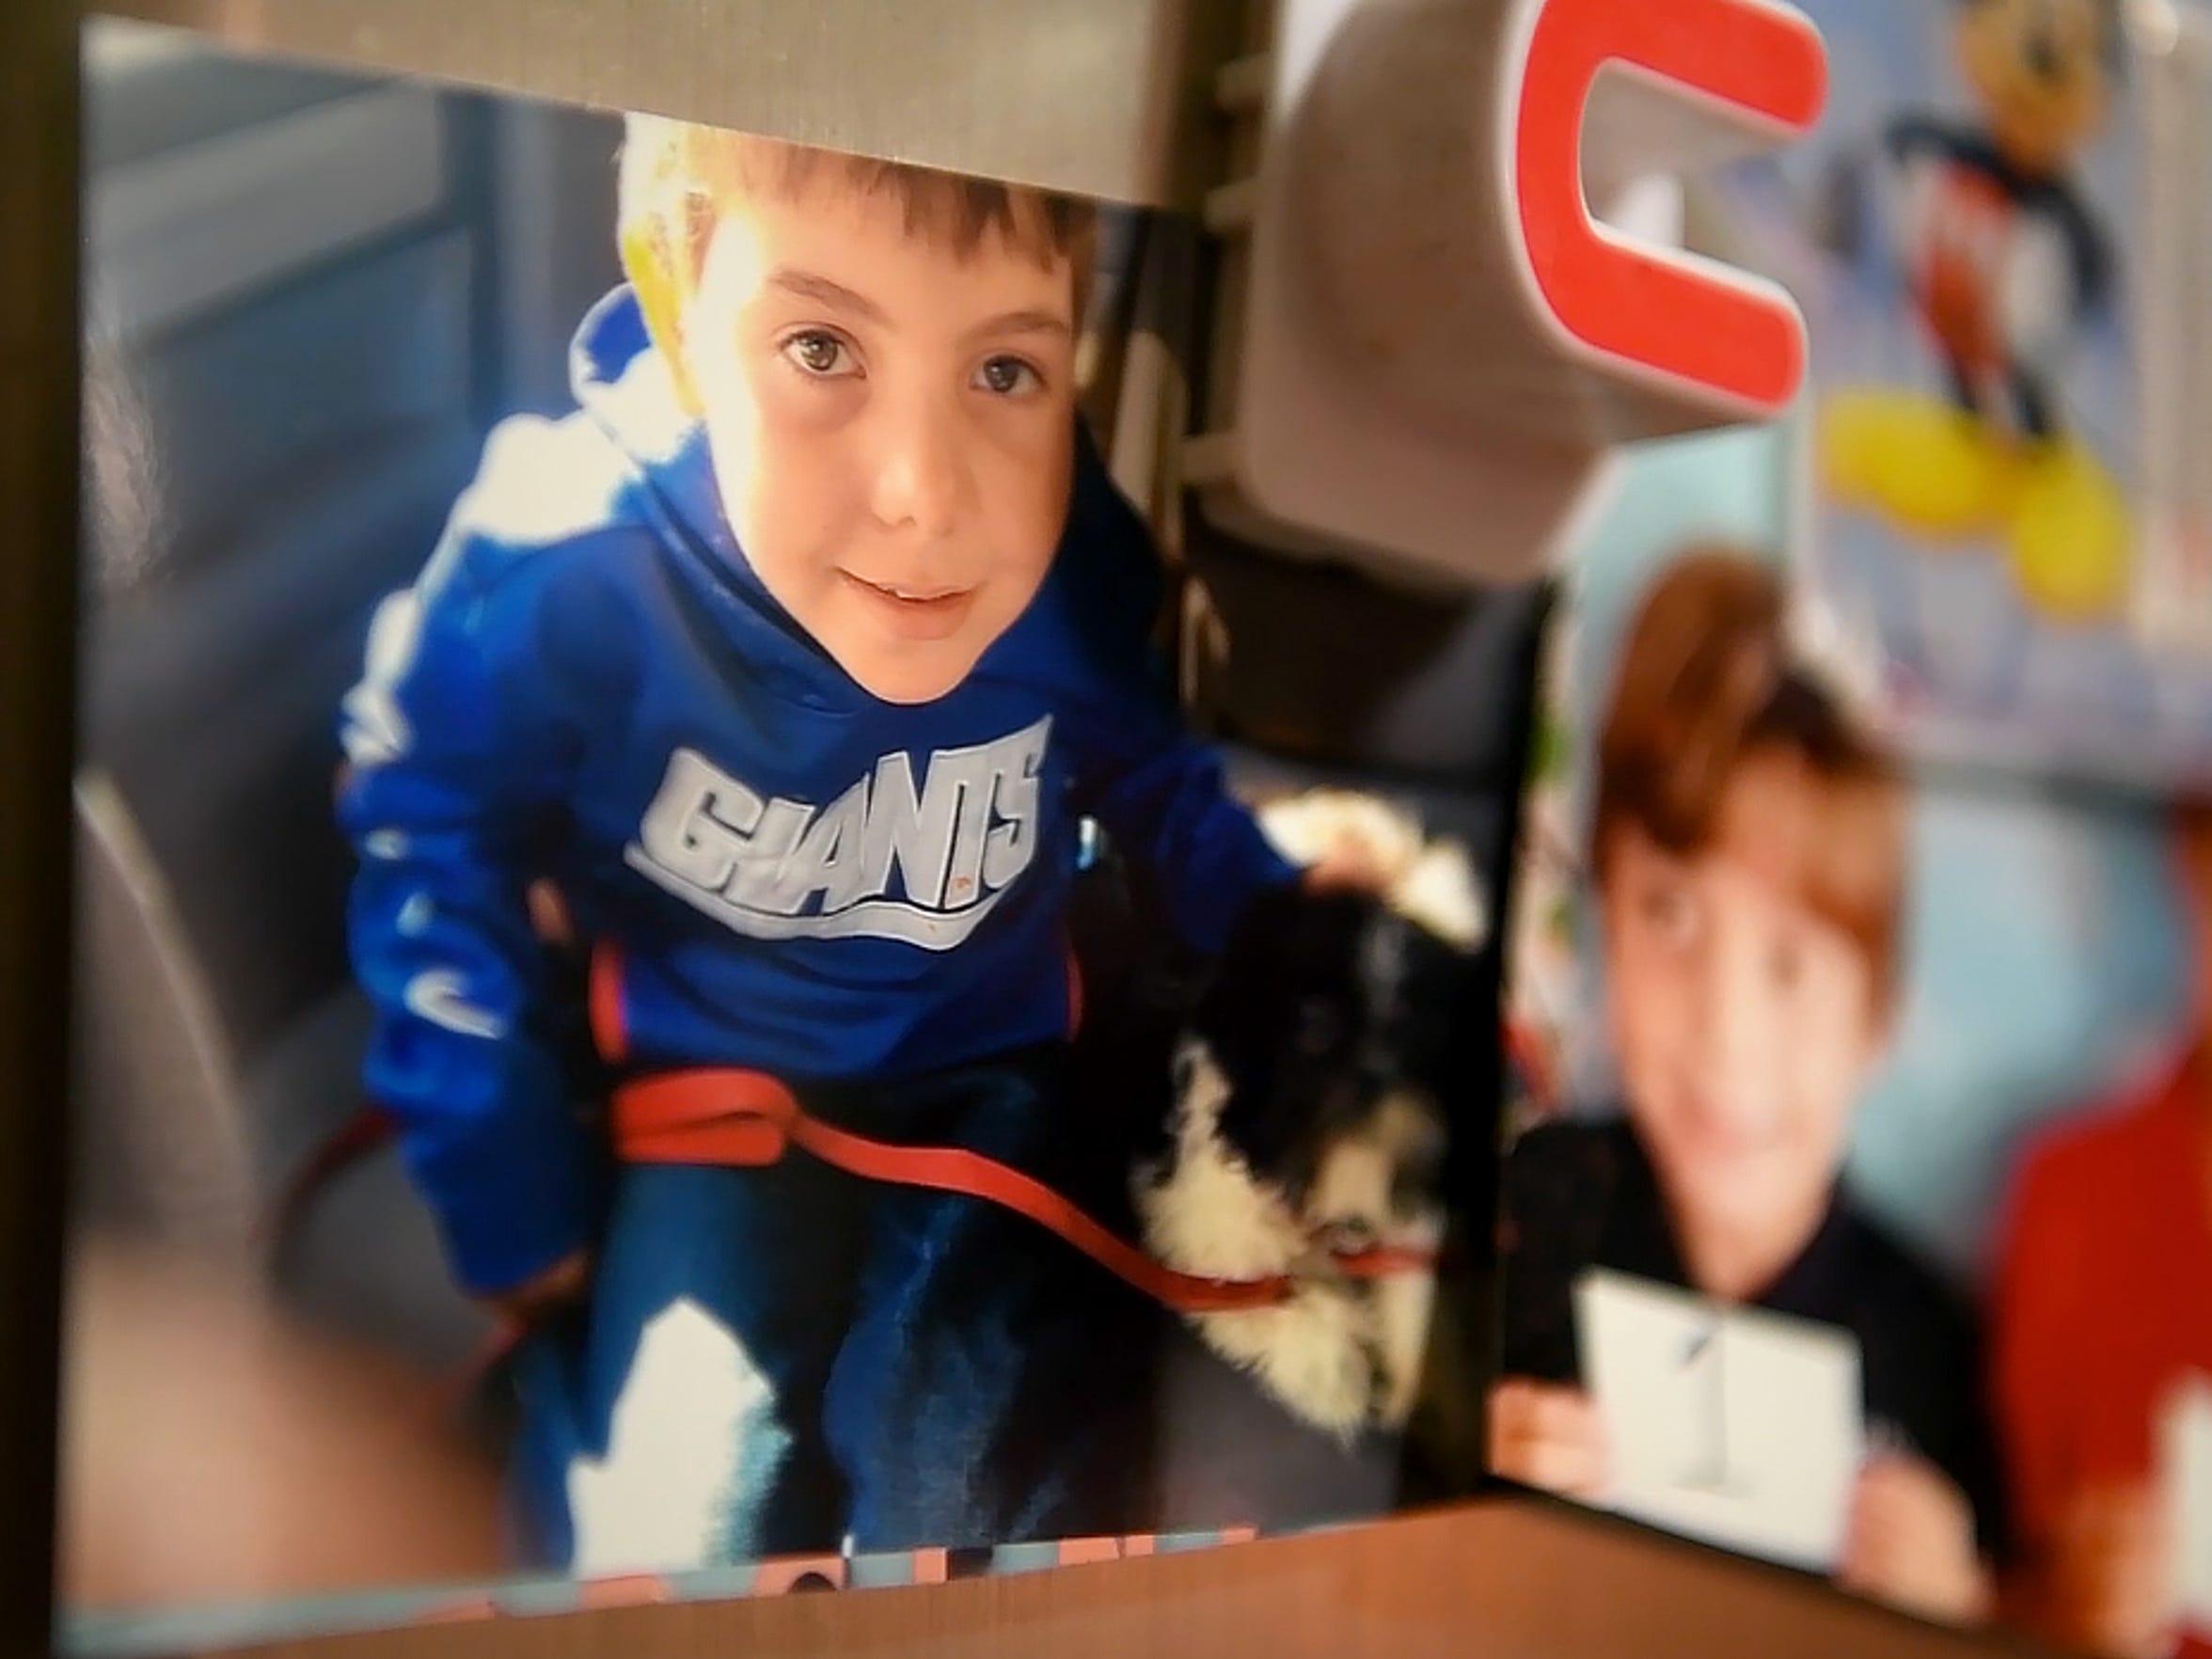 School pictures of Joe Maldonado, 8, who was kicked